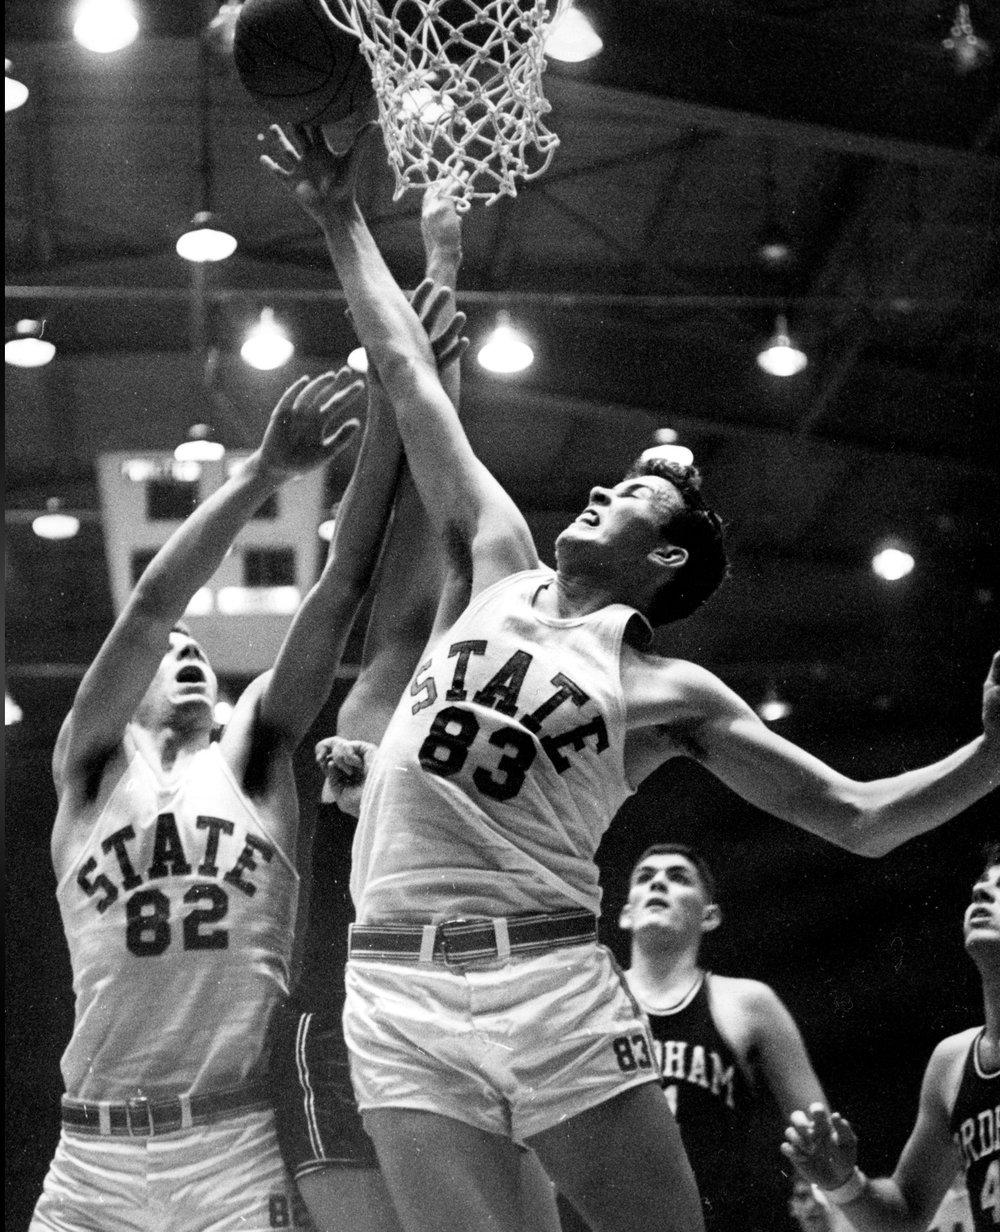 BasketballImage copy.jpg